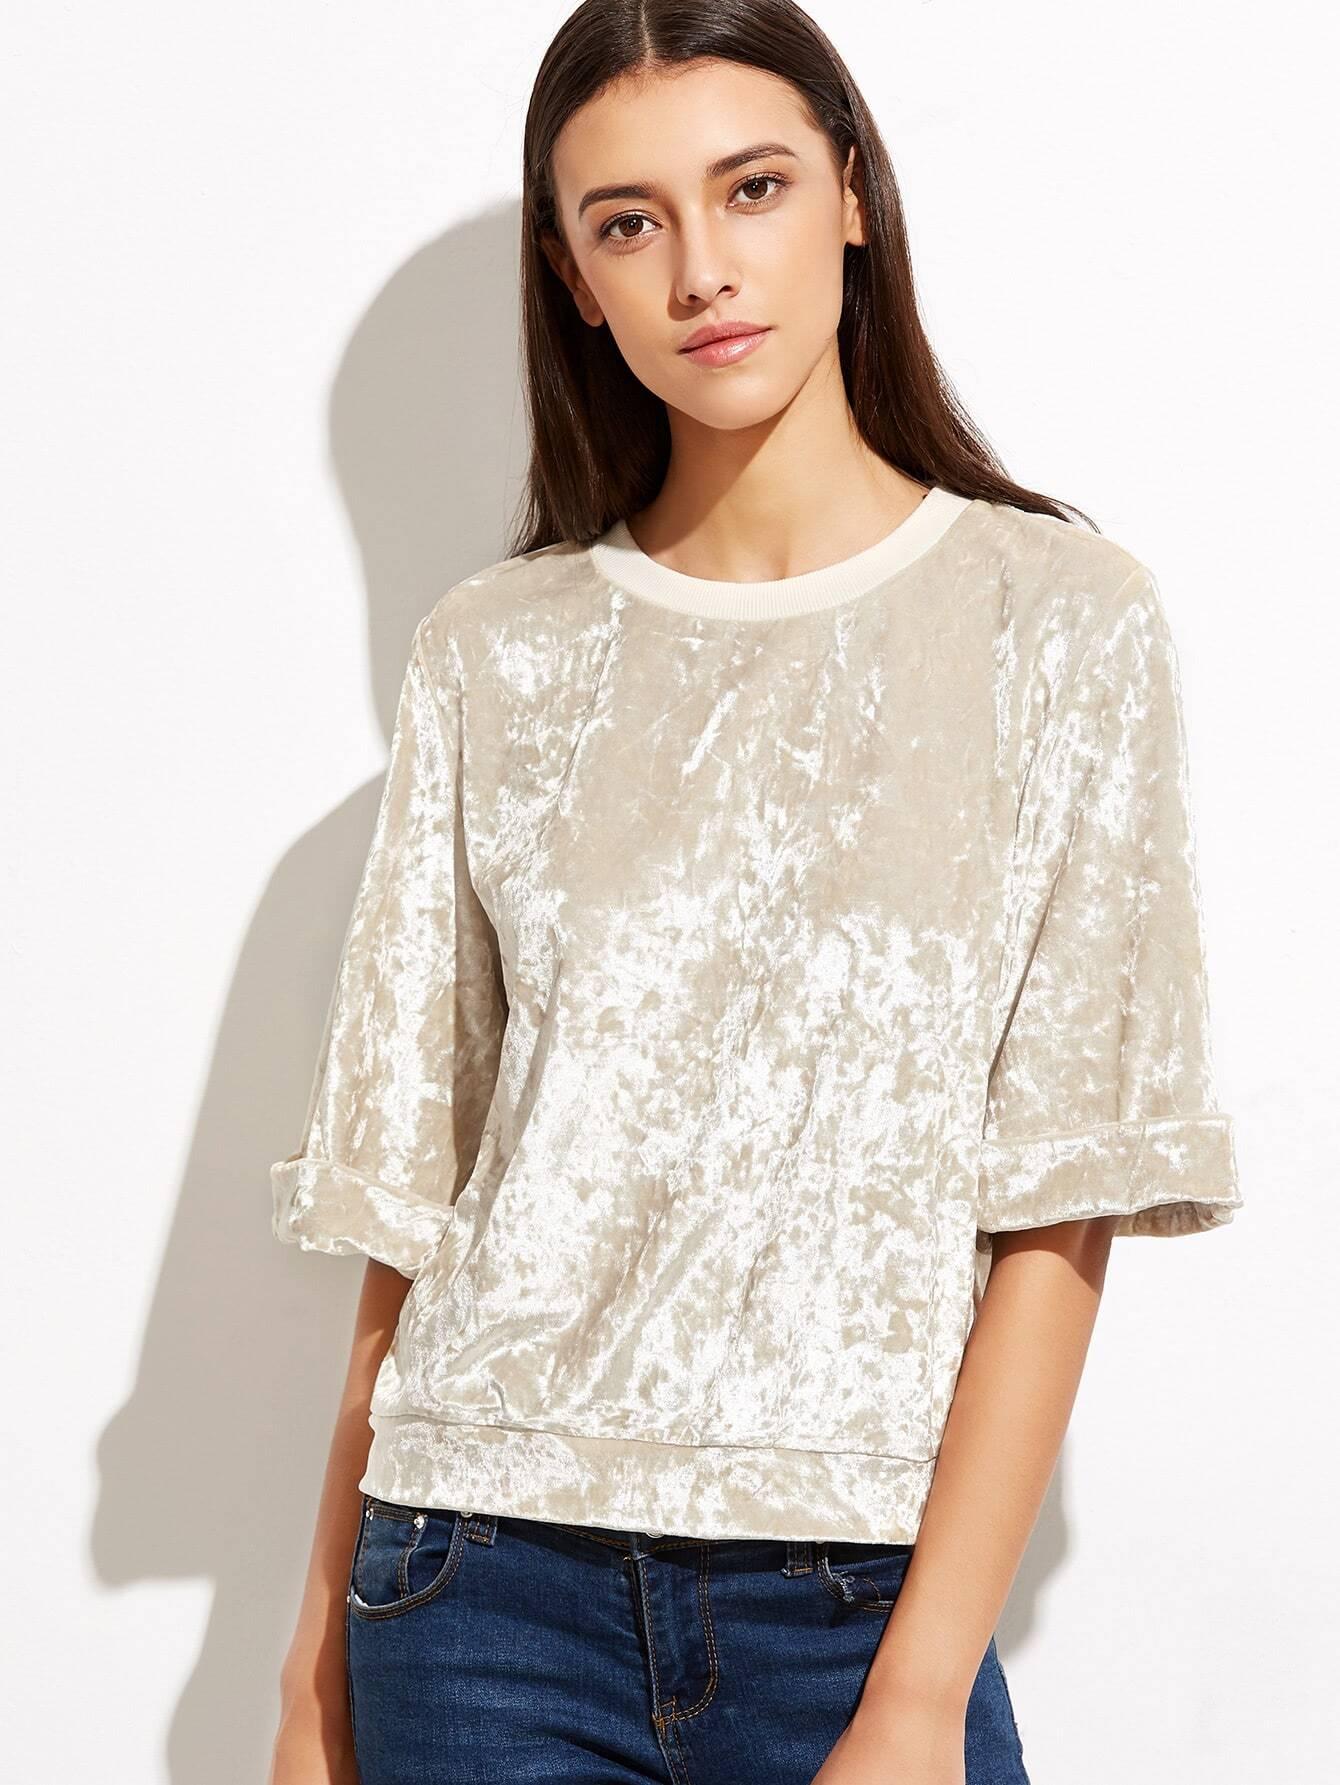 Apricot Crushed Velvet Top blouse160923710